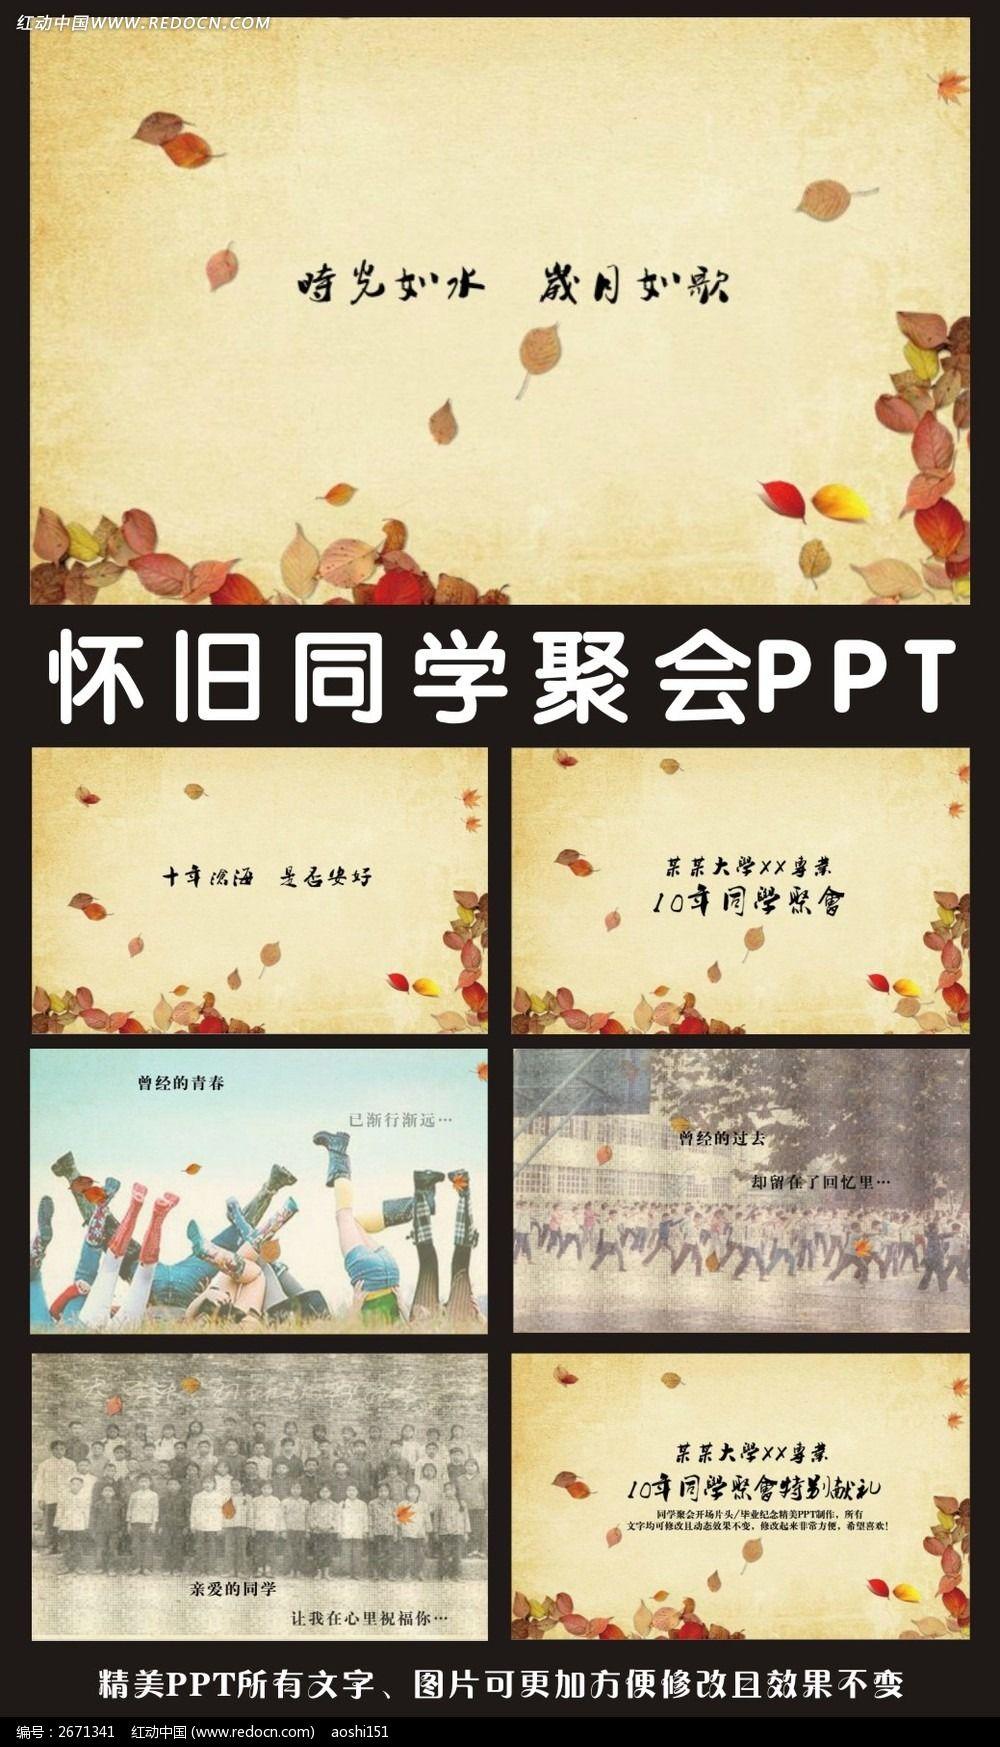 PPT模板 片头 视频素材下载 老电影 怀旧风格 同学录PPT 纪念册 同